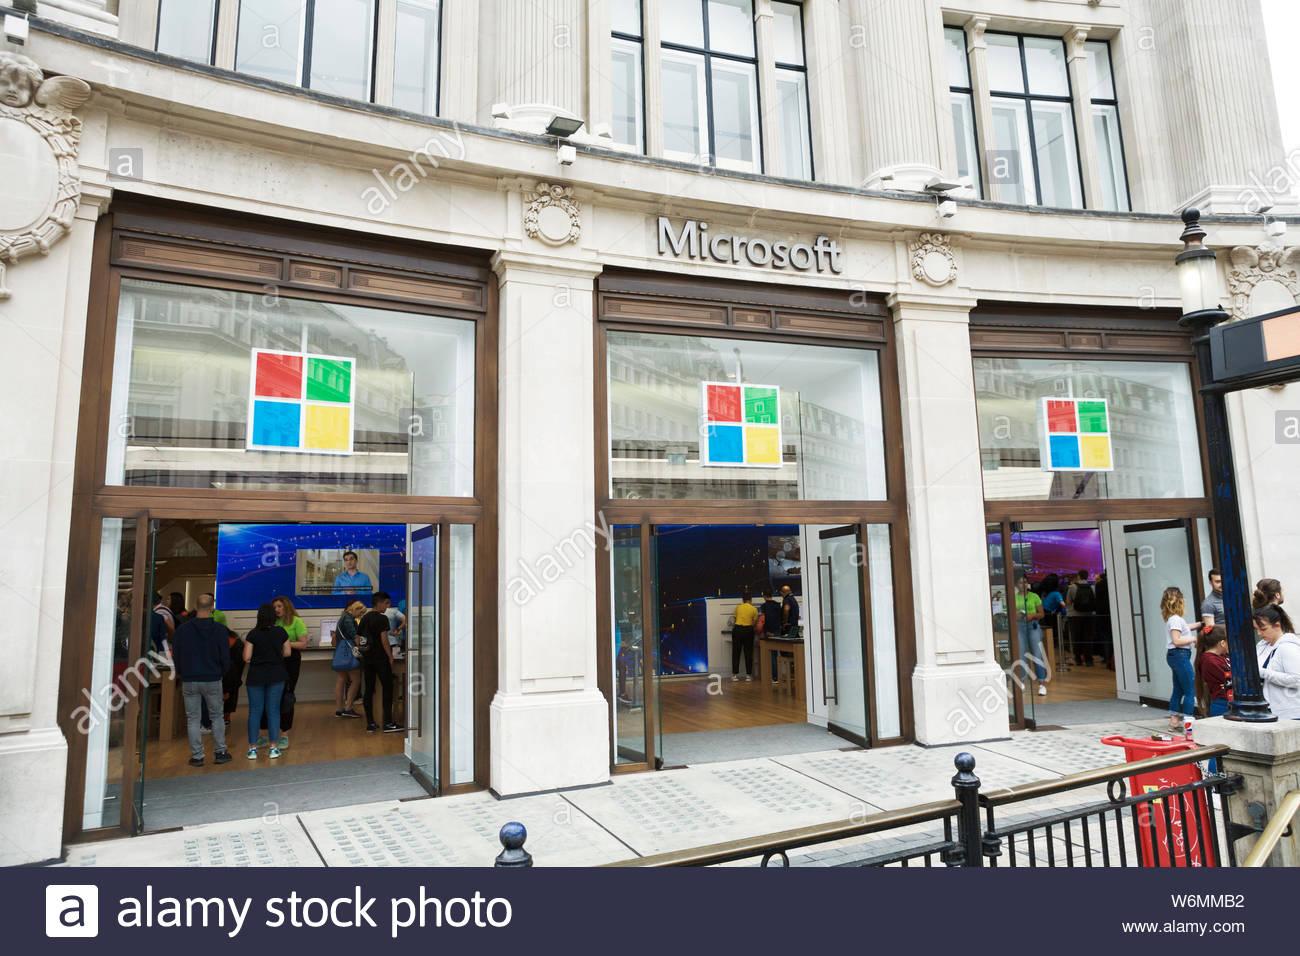 microsoft-store-london-uk-W6MMB2.jpg